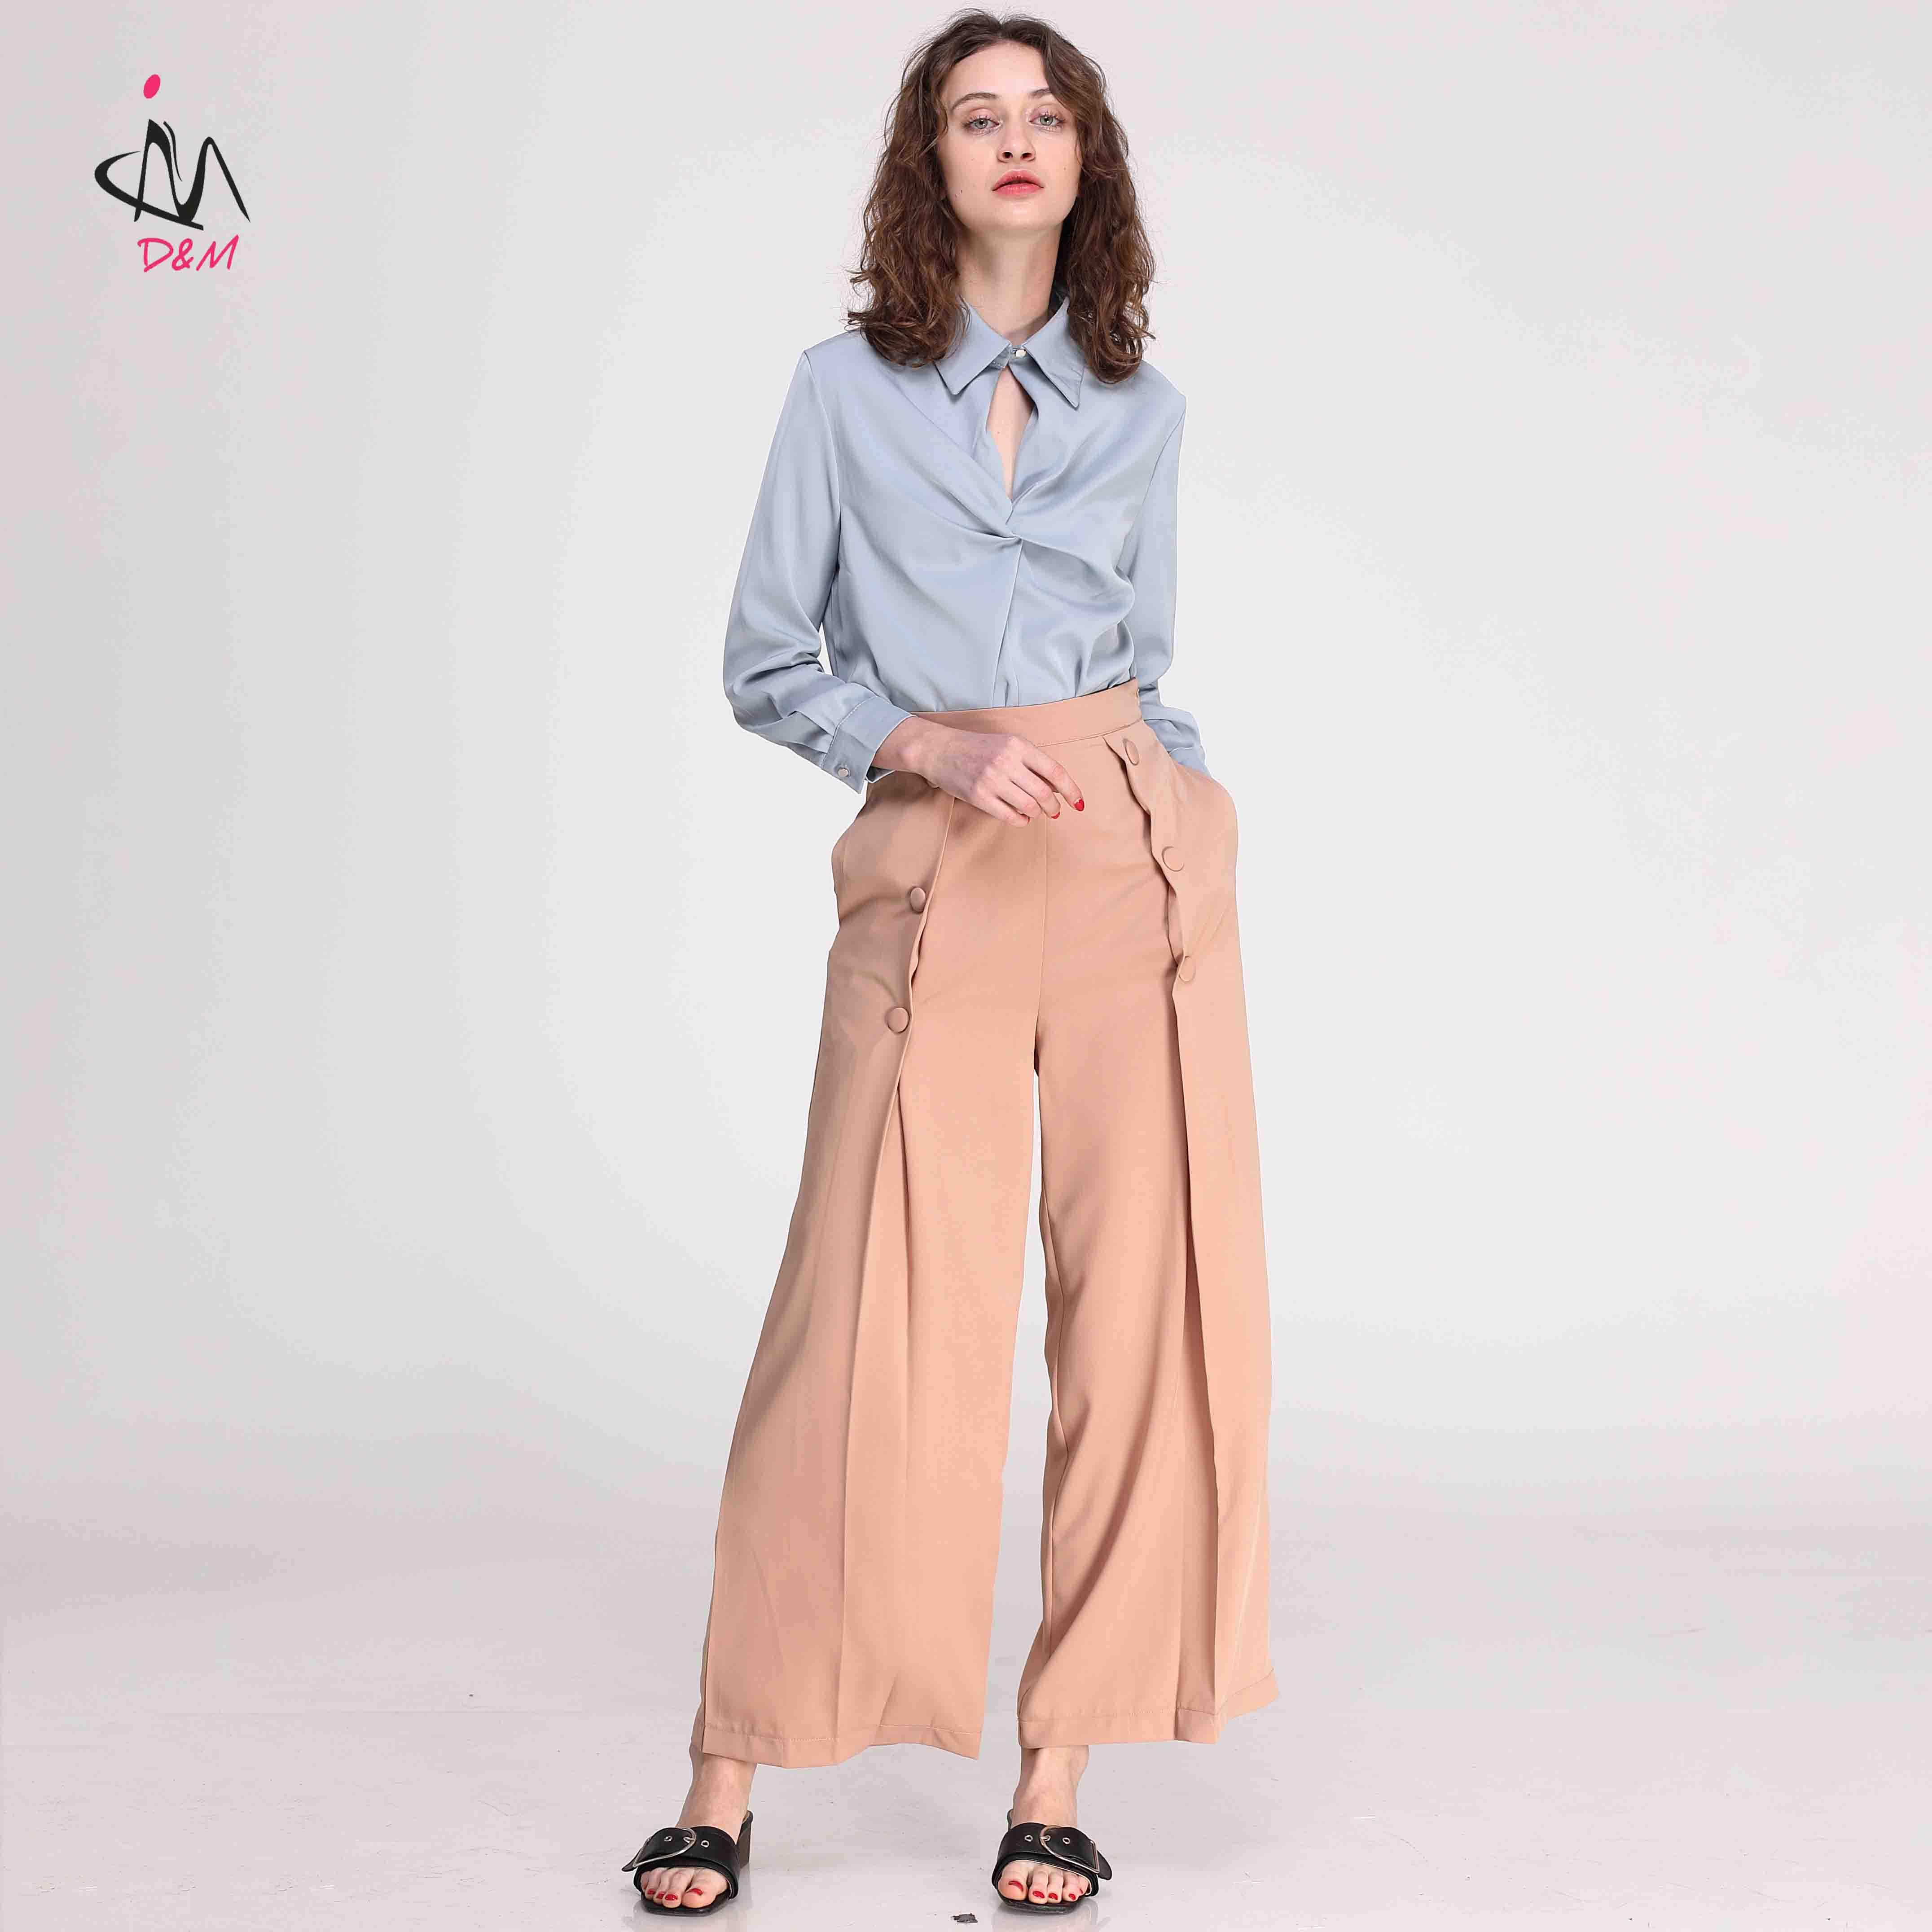 Ultimo Pantalones De Diseno Para Damas De Botones De Tela Pantalones De Las Mujeres Buy Trousers Women Women S Trousers Pants Wide Leg Pants Product On Alibaba Com